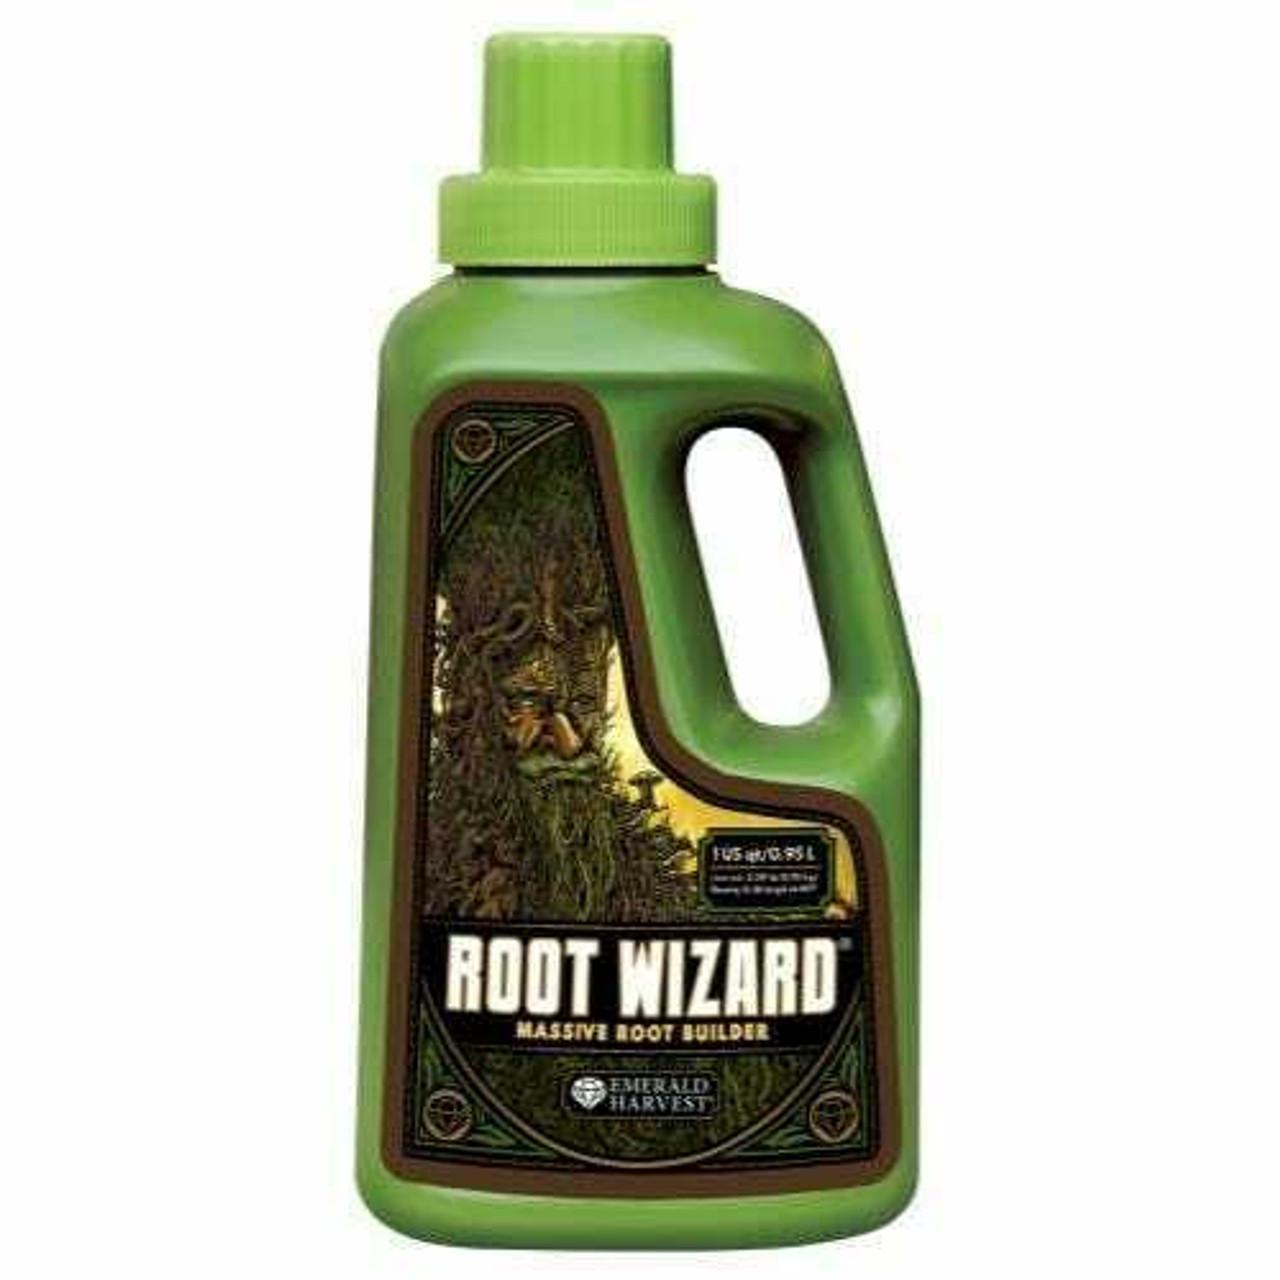 Emerald Harvest Root Wizard Quart/0.95 Liter